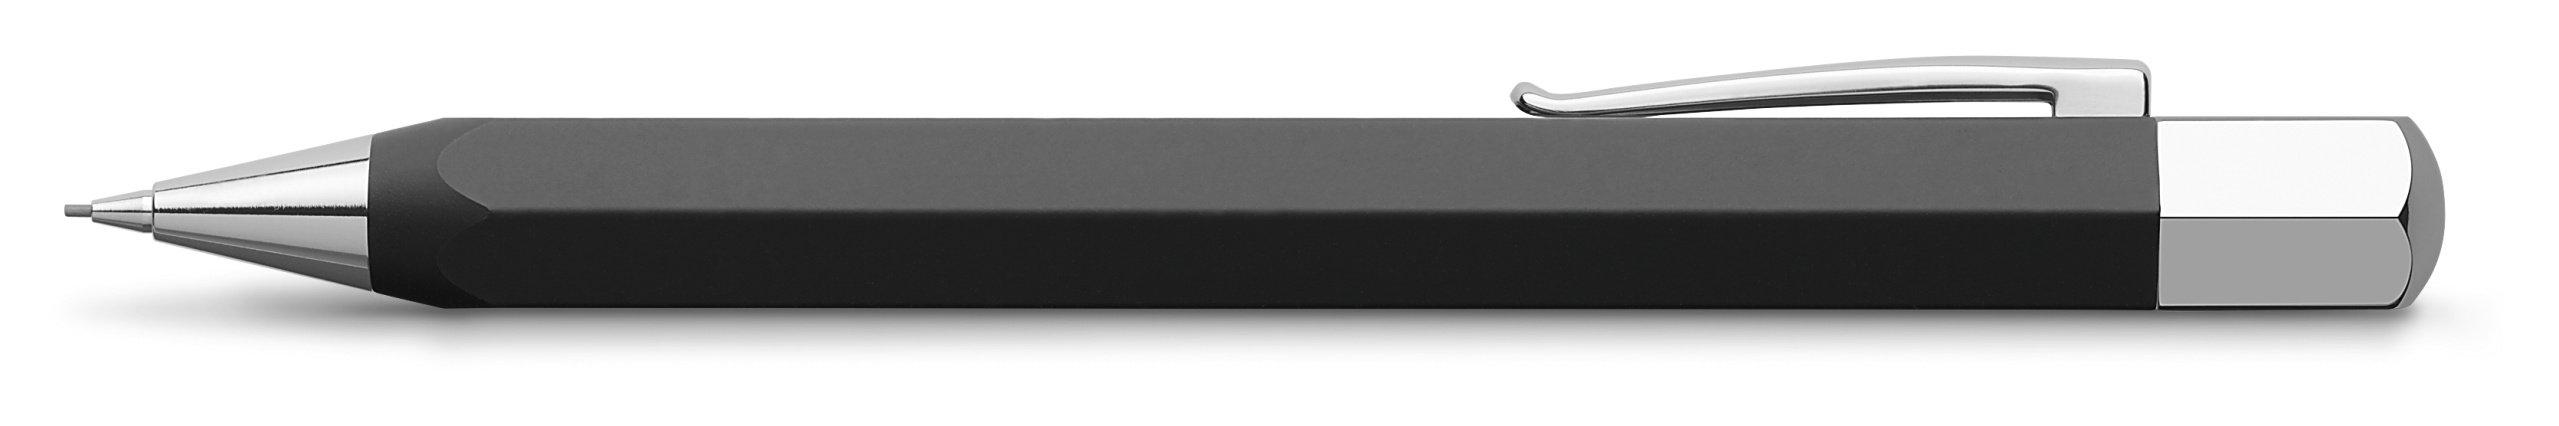 Faber-Castell Ondoro Mechanical Pencil - Graphite Black